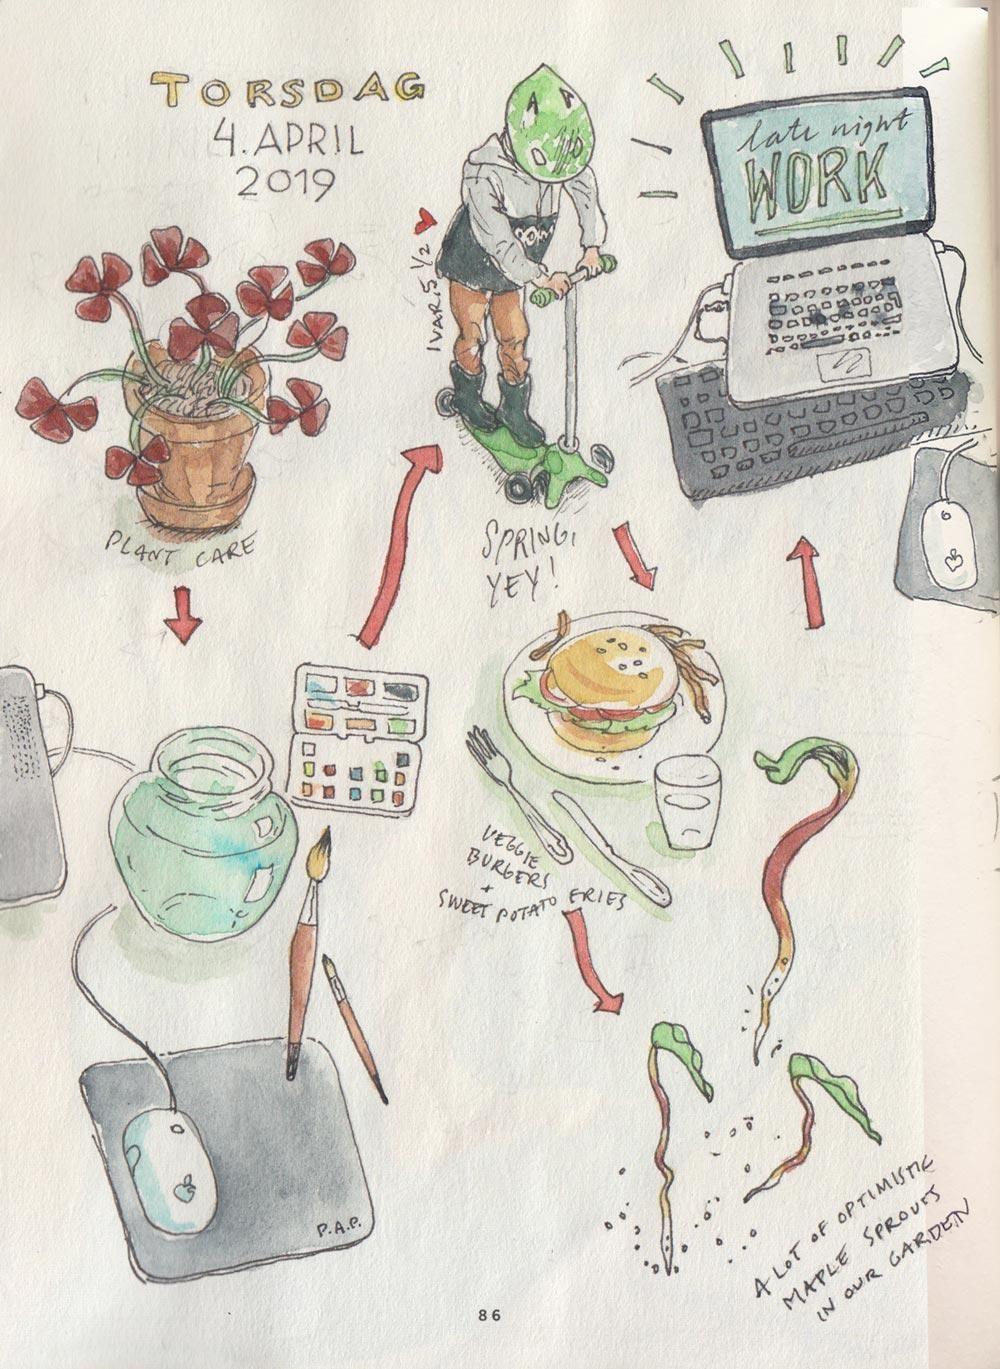 My Sketckbook Journal April 2 2019 - image 2 - student project